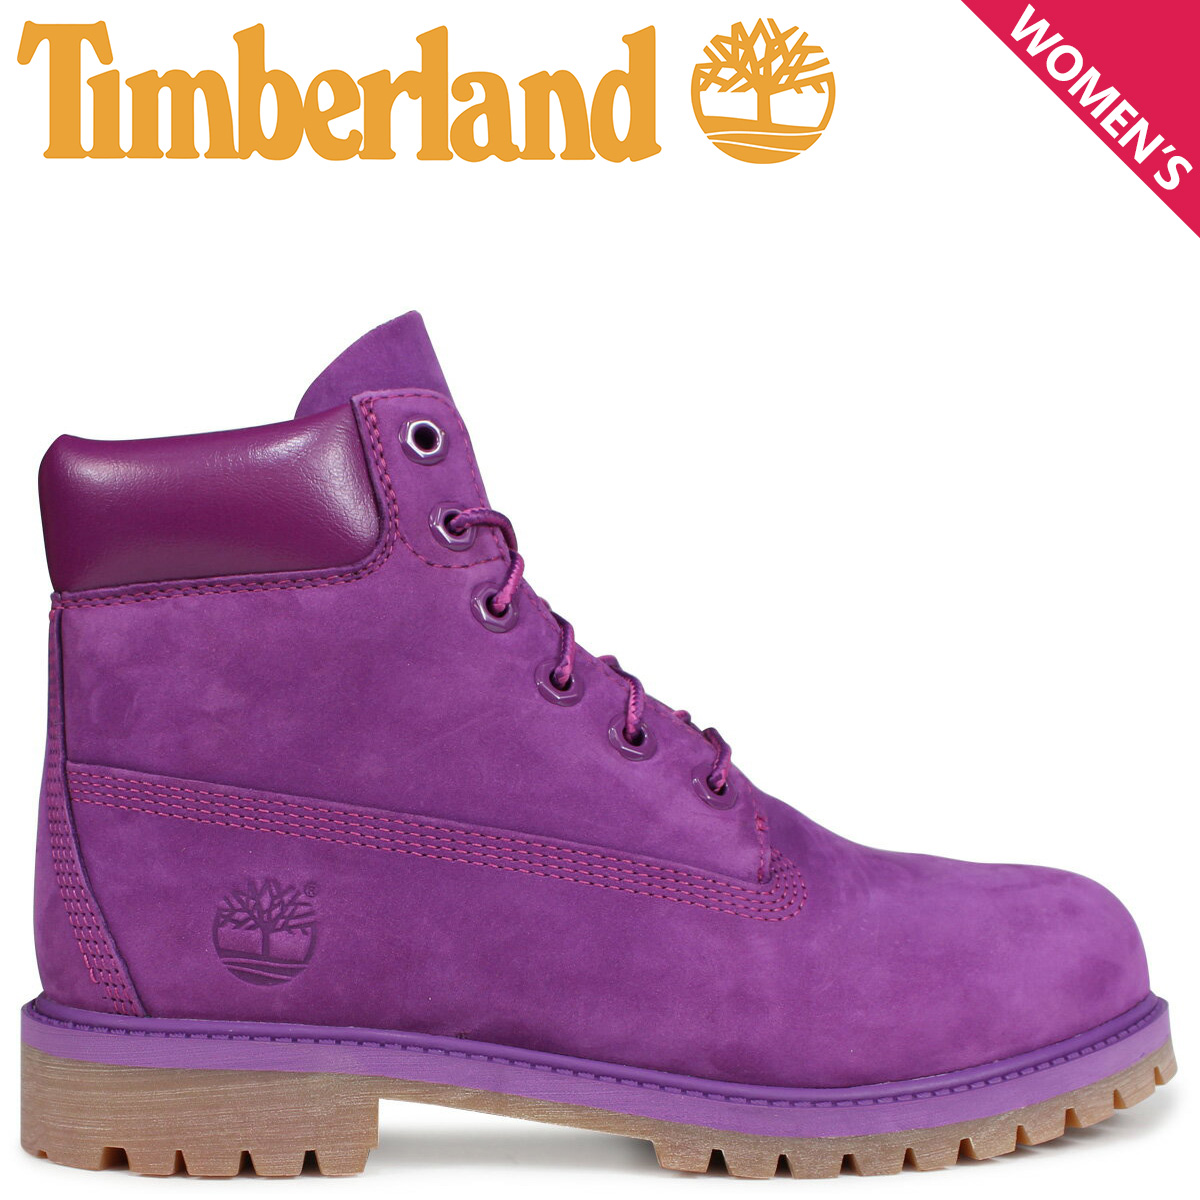 Timberland レディース ブーツ 6インチ ティンバーランド キッズ JUNIOR 6INCHI PREMIUM WATERPROOF BOOT A1VAZ Wワイズ 防水 パープル